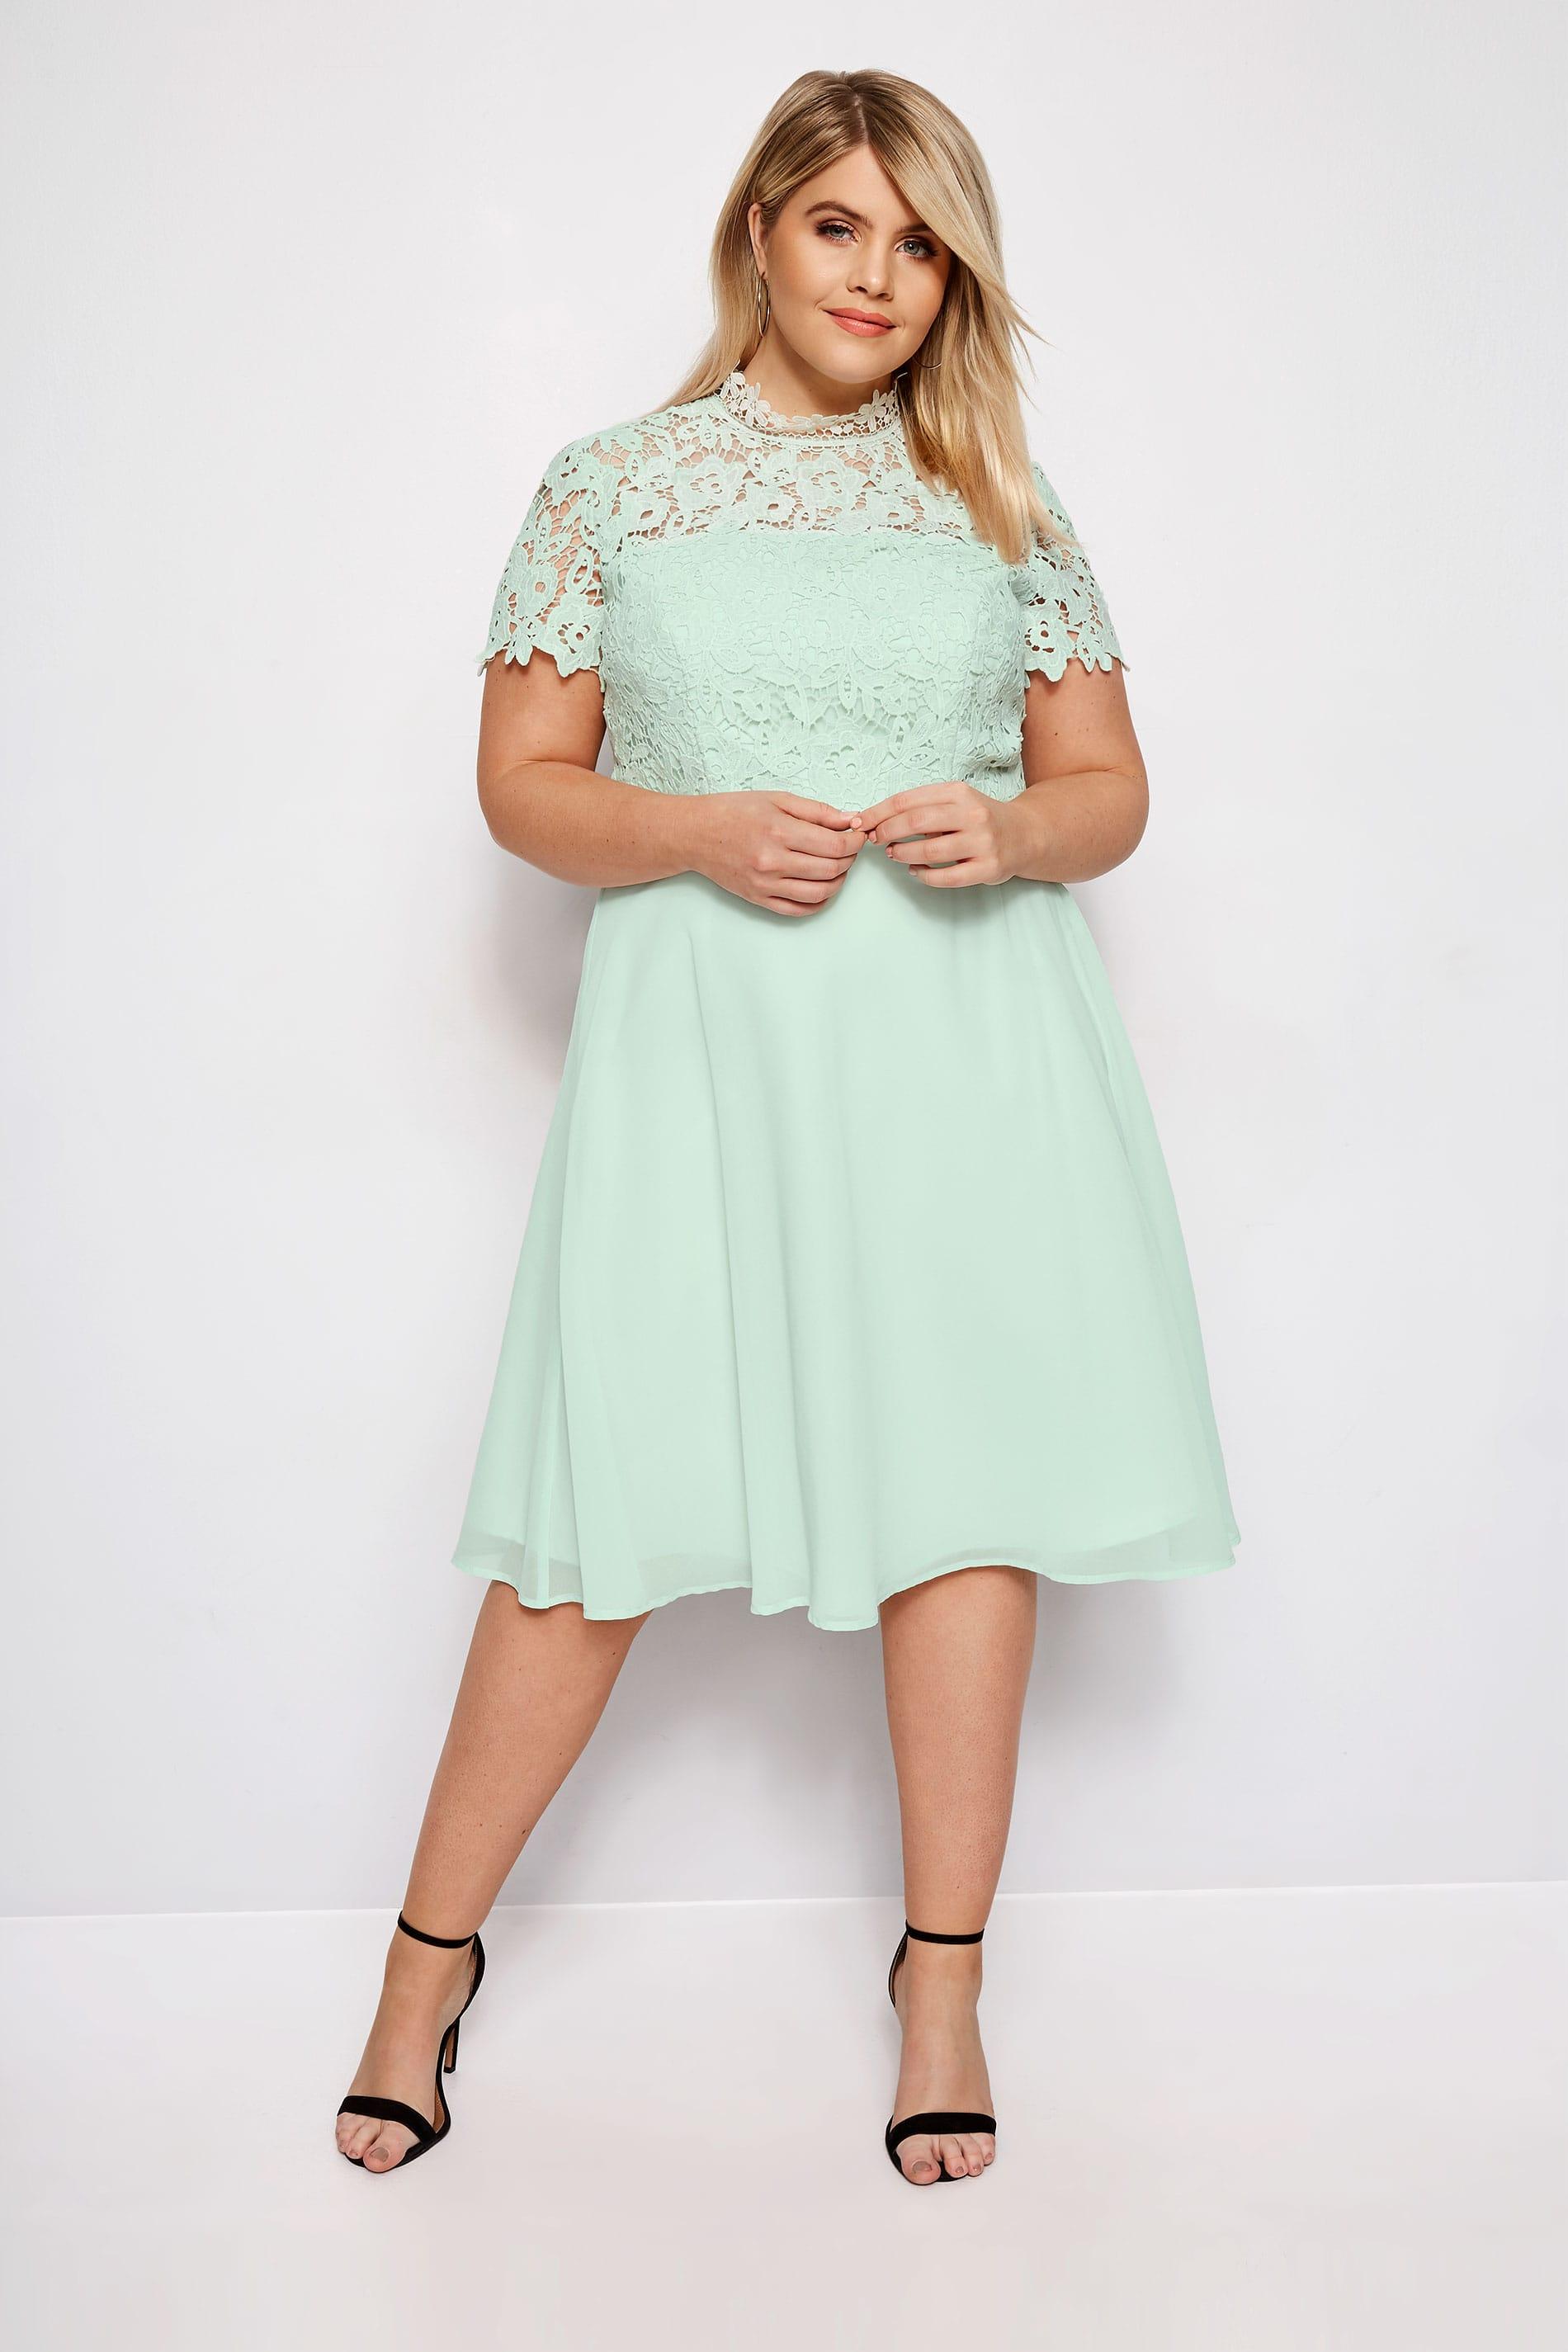 Wonderbaar CHI CHI Mintgroene Sonny jurk, grote maten 44-54   Yours Clothing HW-85